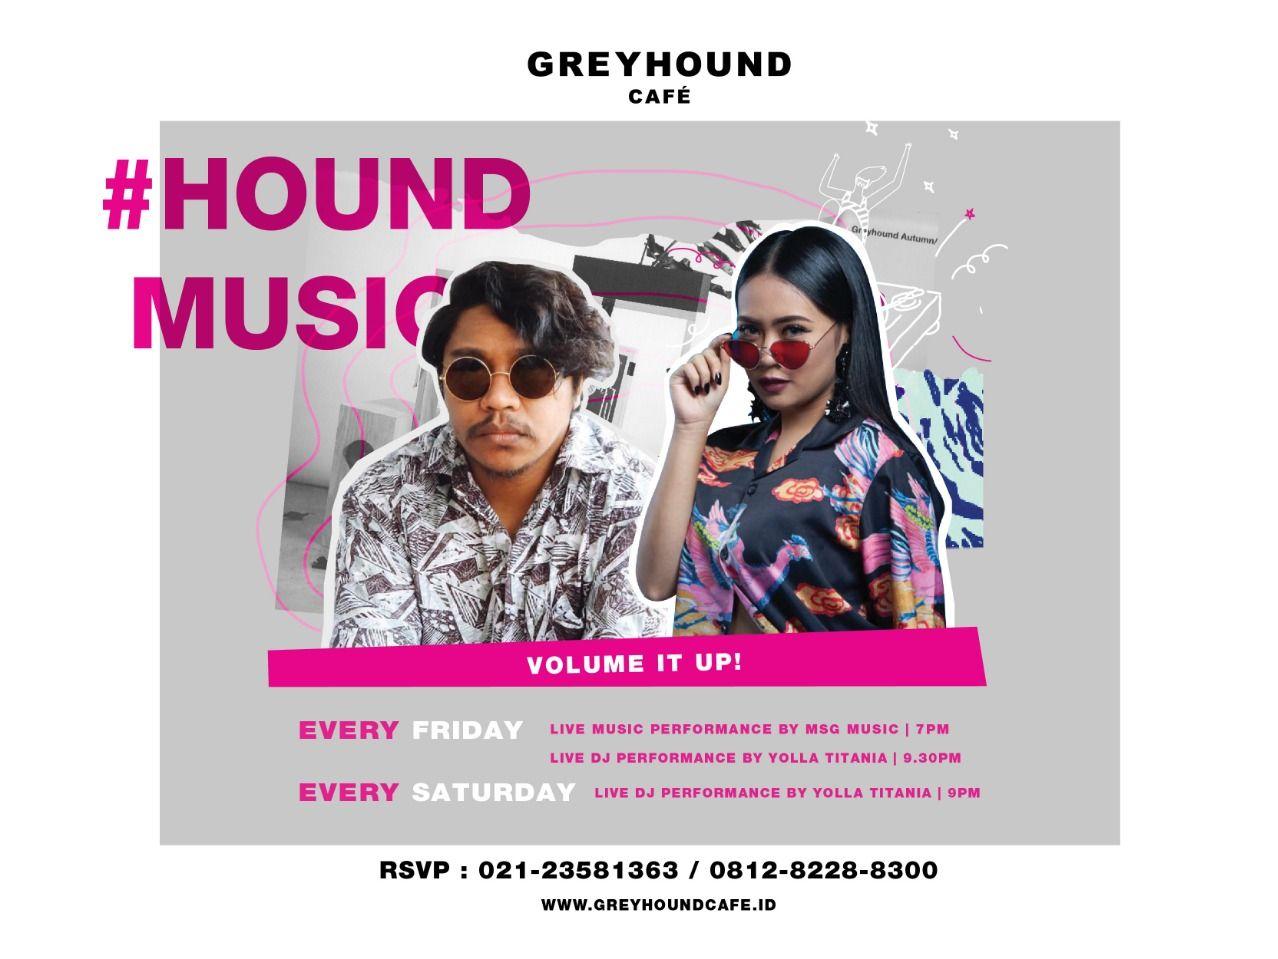 HOUND MUSIC EVERY FRIDAY AND SATURDAY image